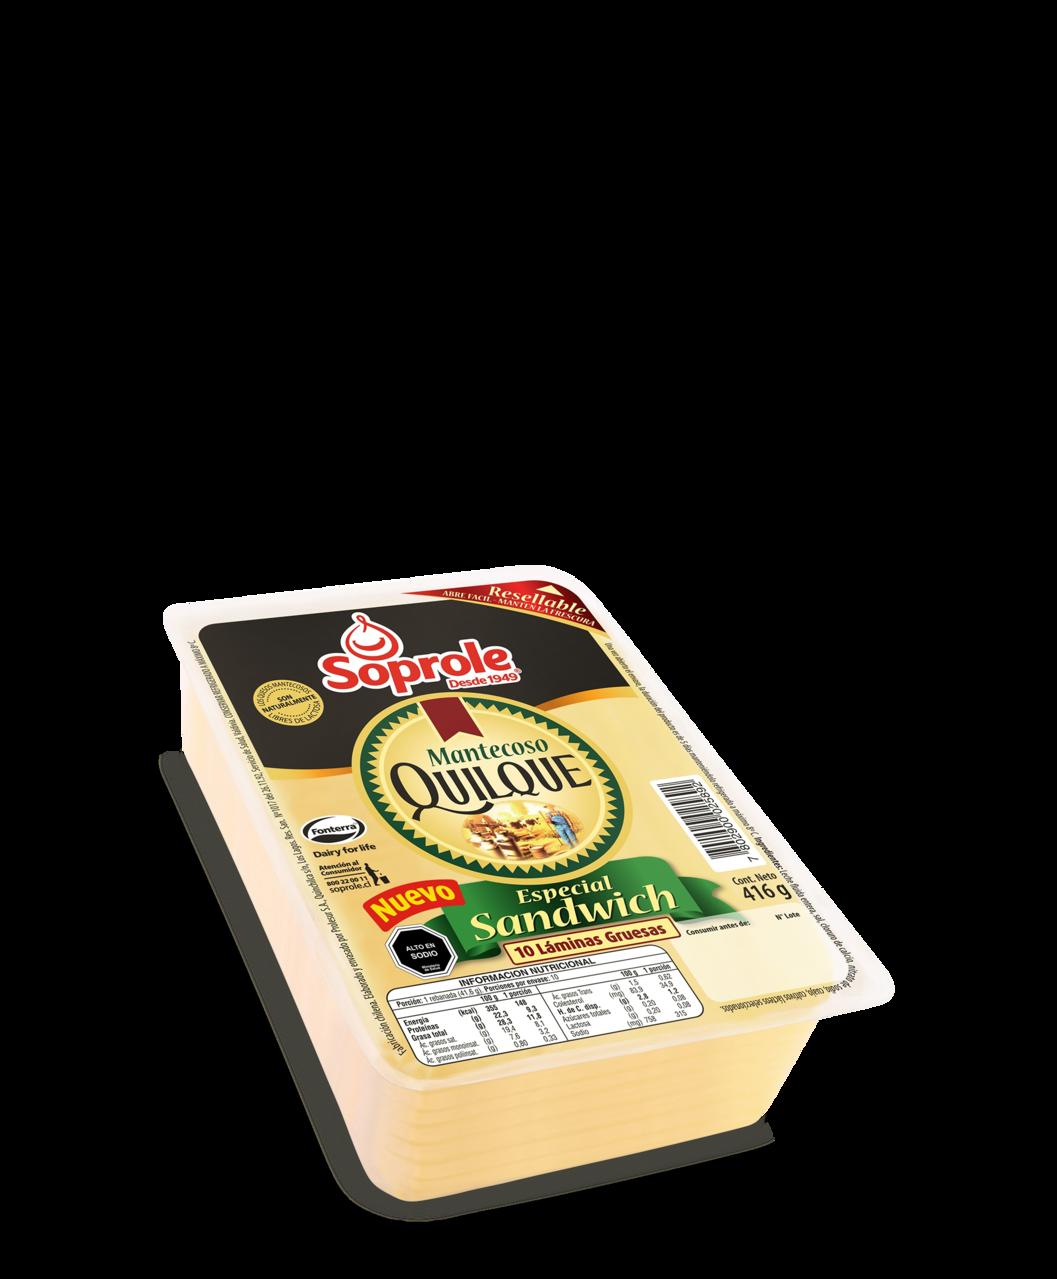 Soprole queso quilque mantecoso sandwich 416g